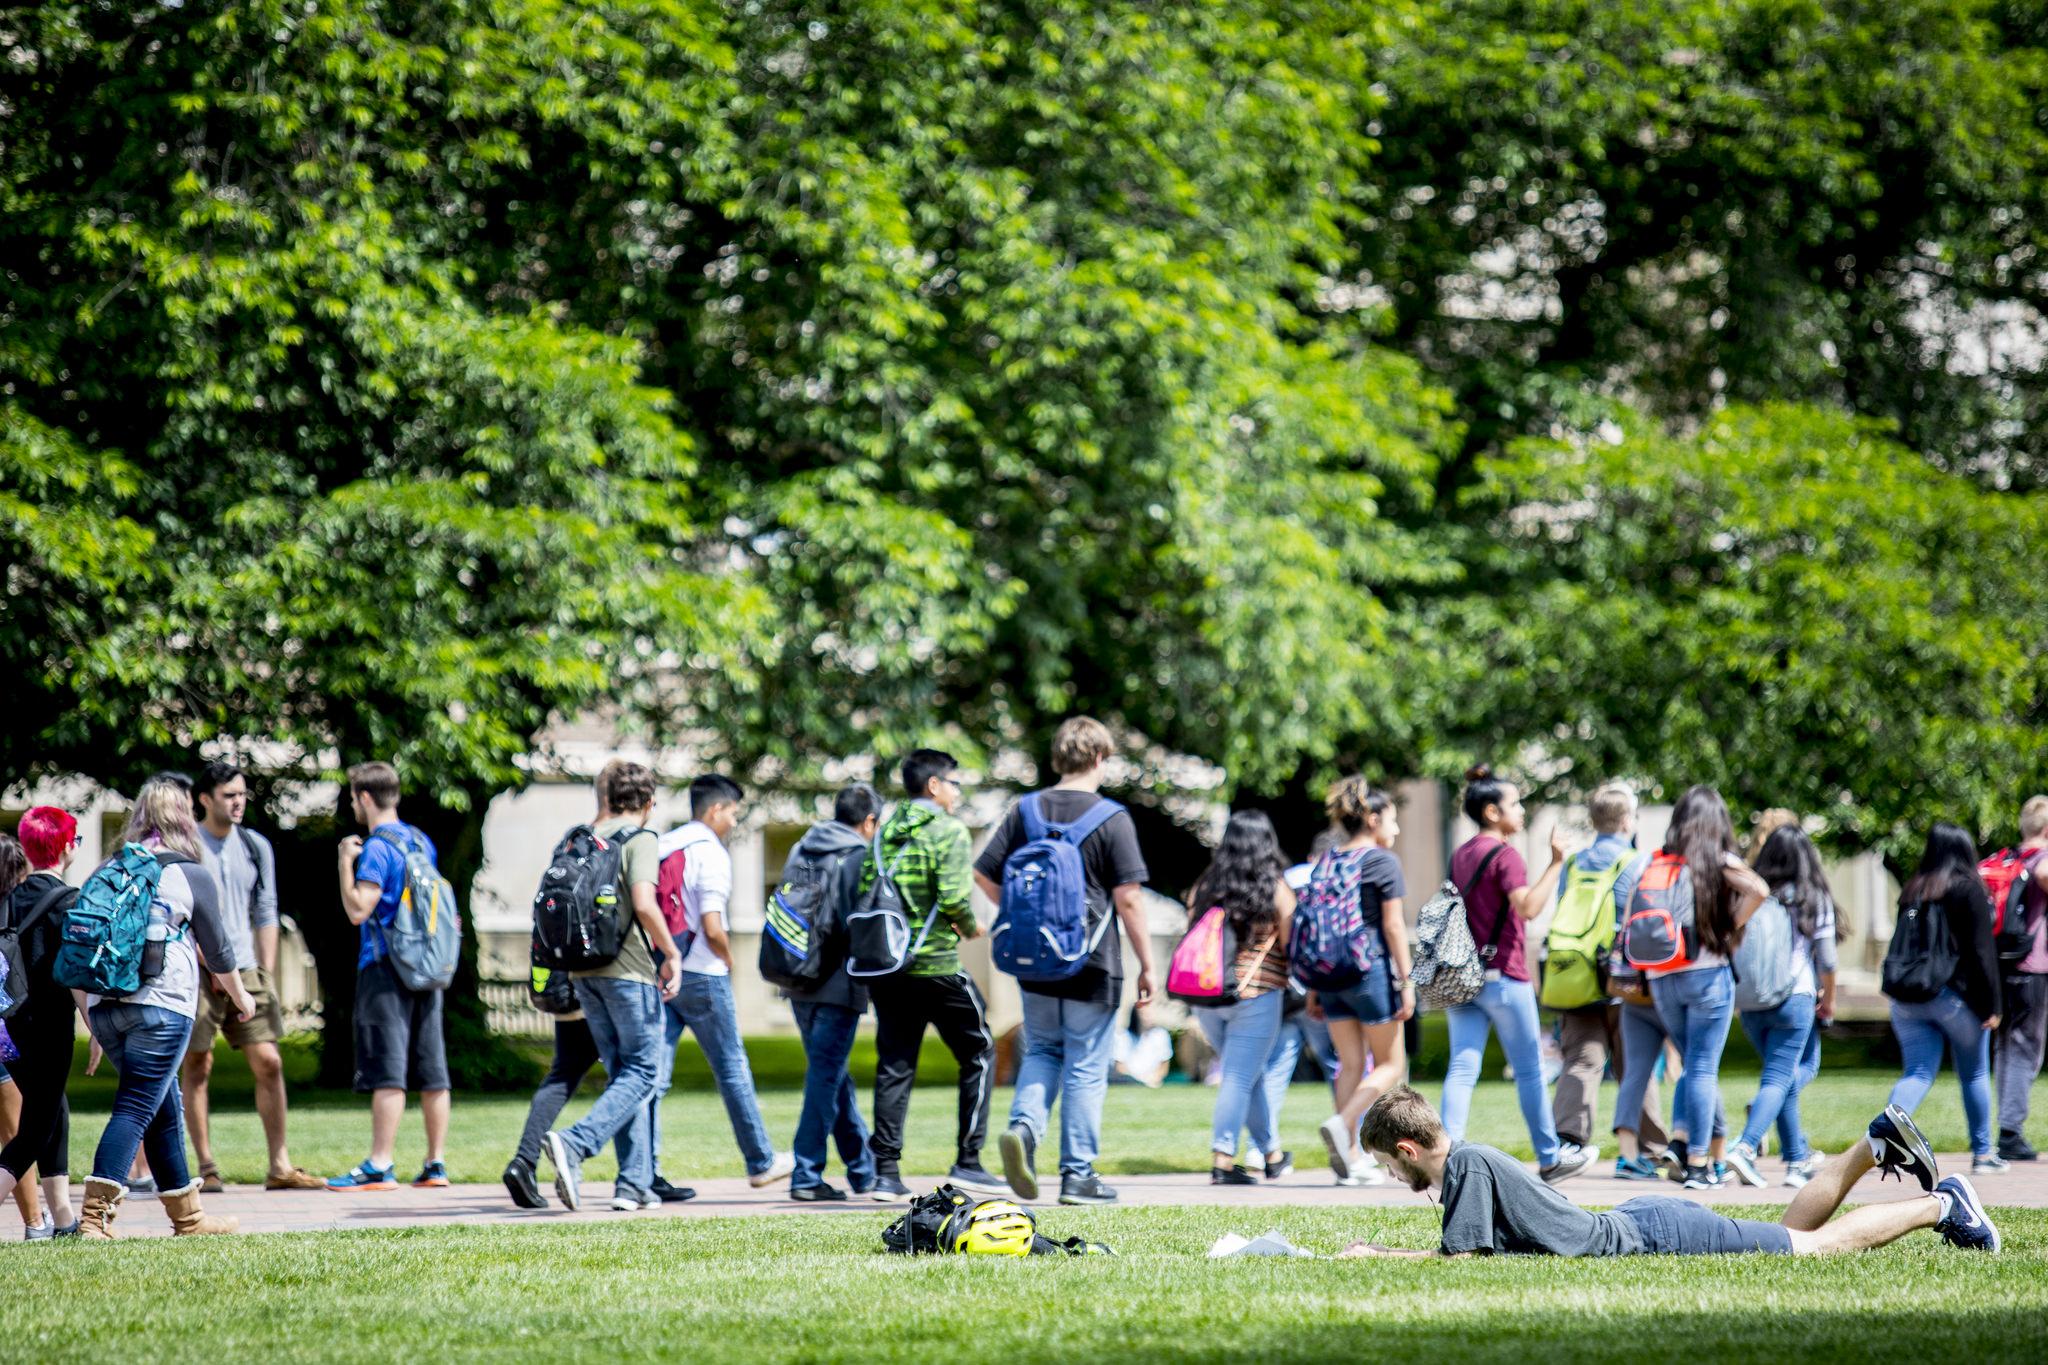 UW Students walking around campus